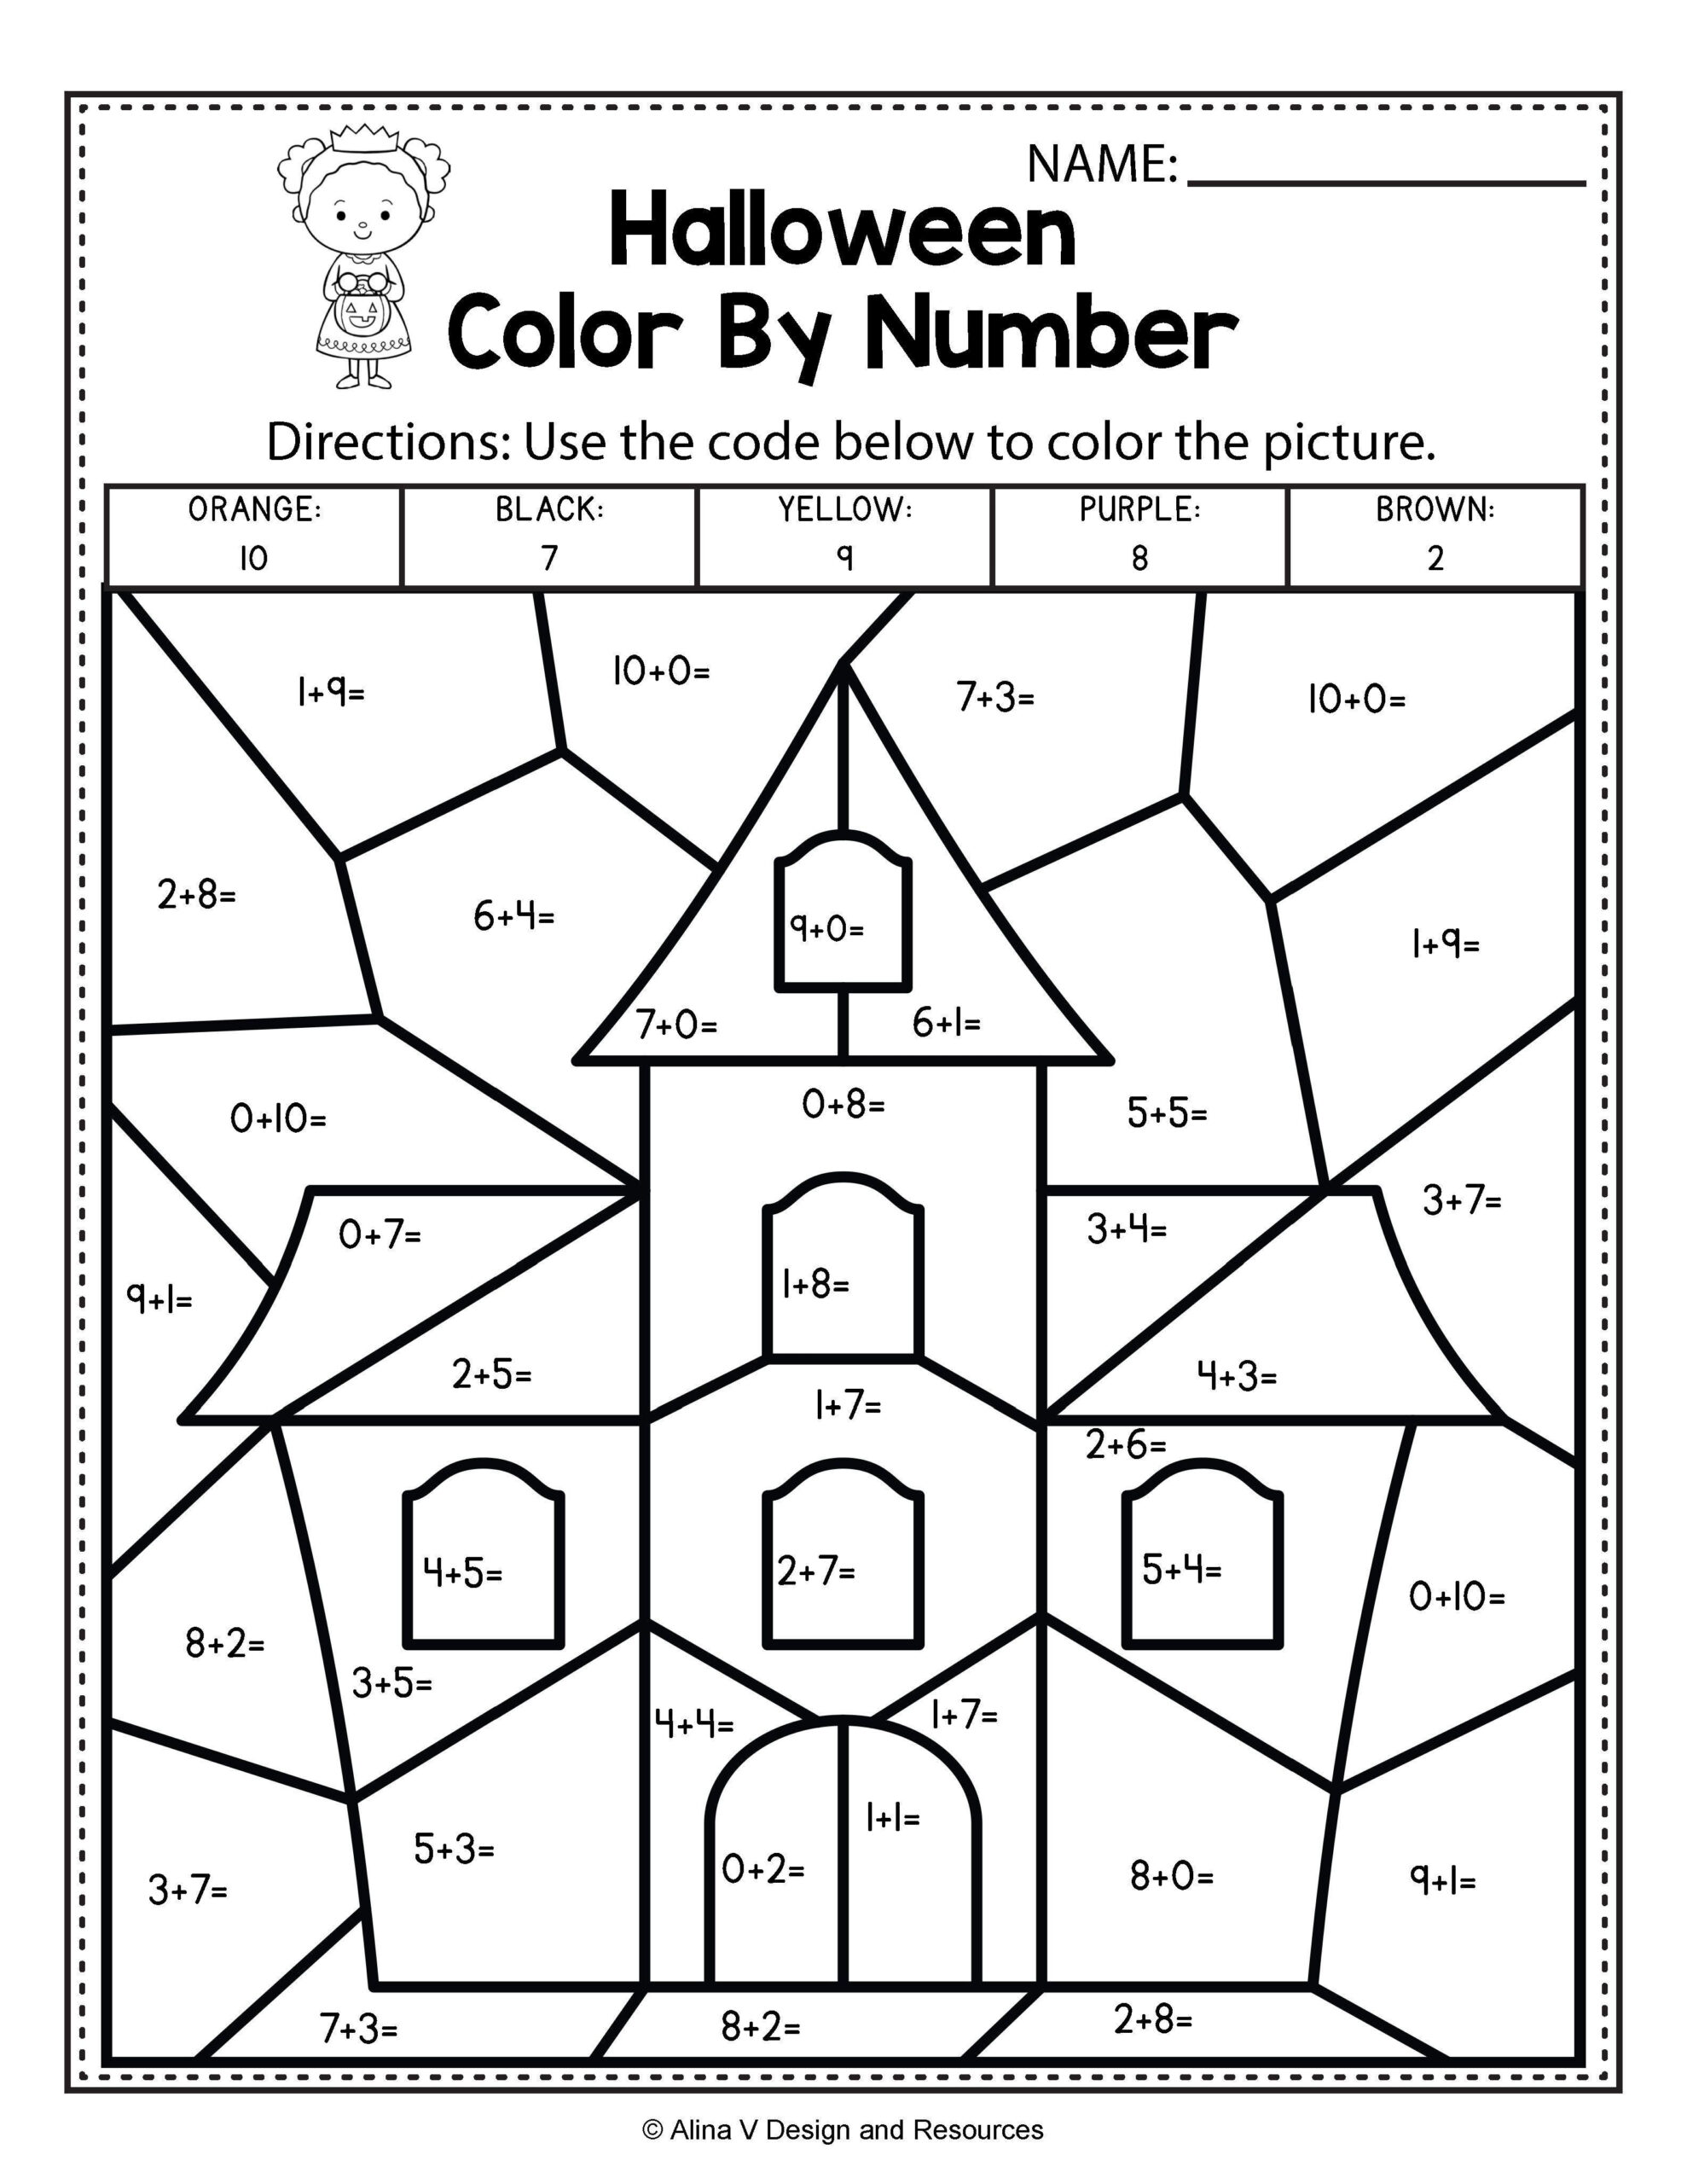 Letter P Halloween Worksheets   Printable Worksheets And